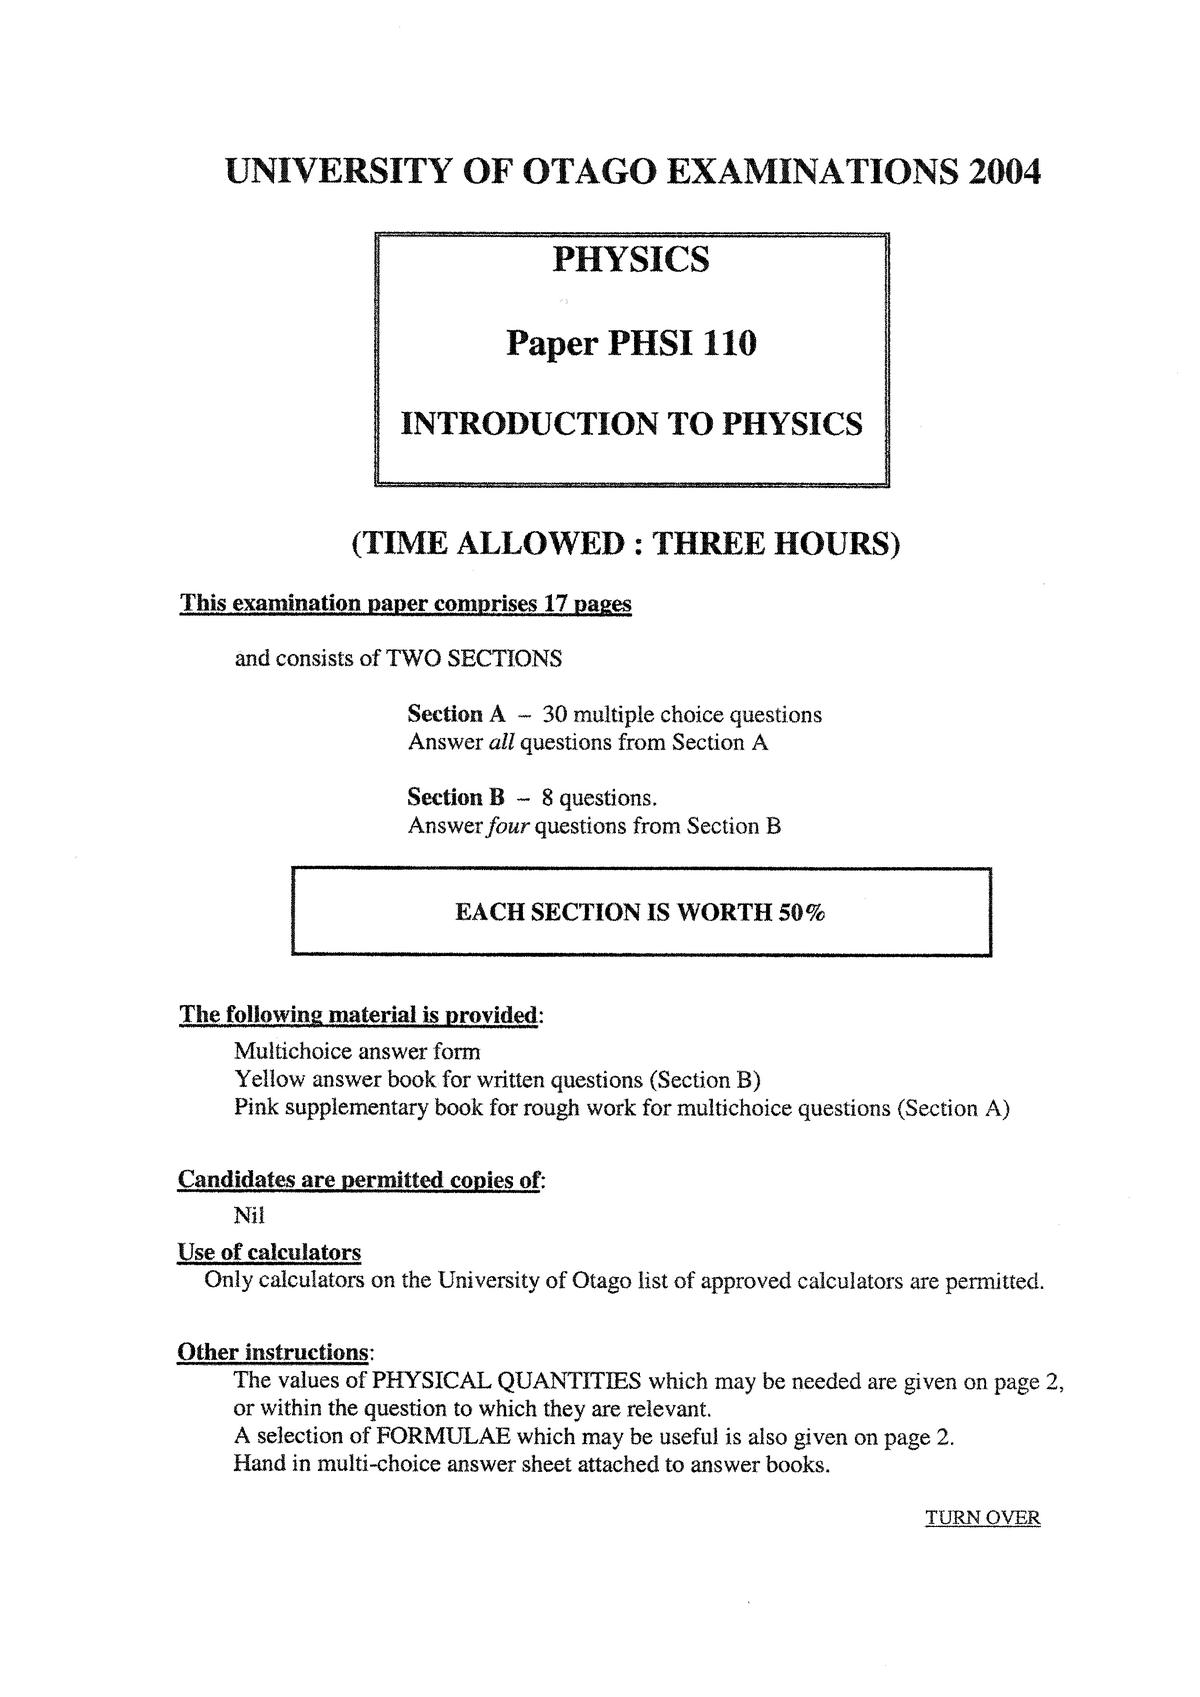 Exam 2004 - PHSI131: Fundamentals of Physics I - StuDocu